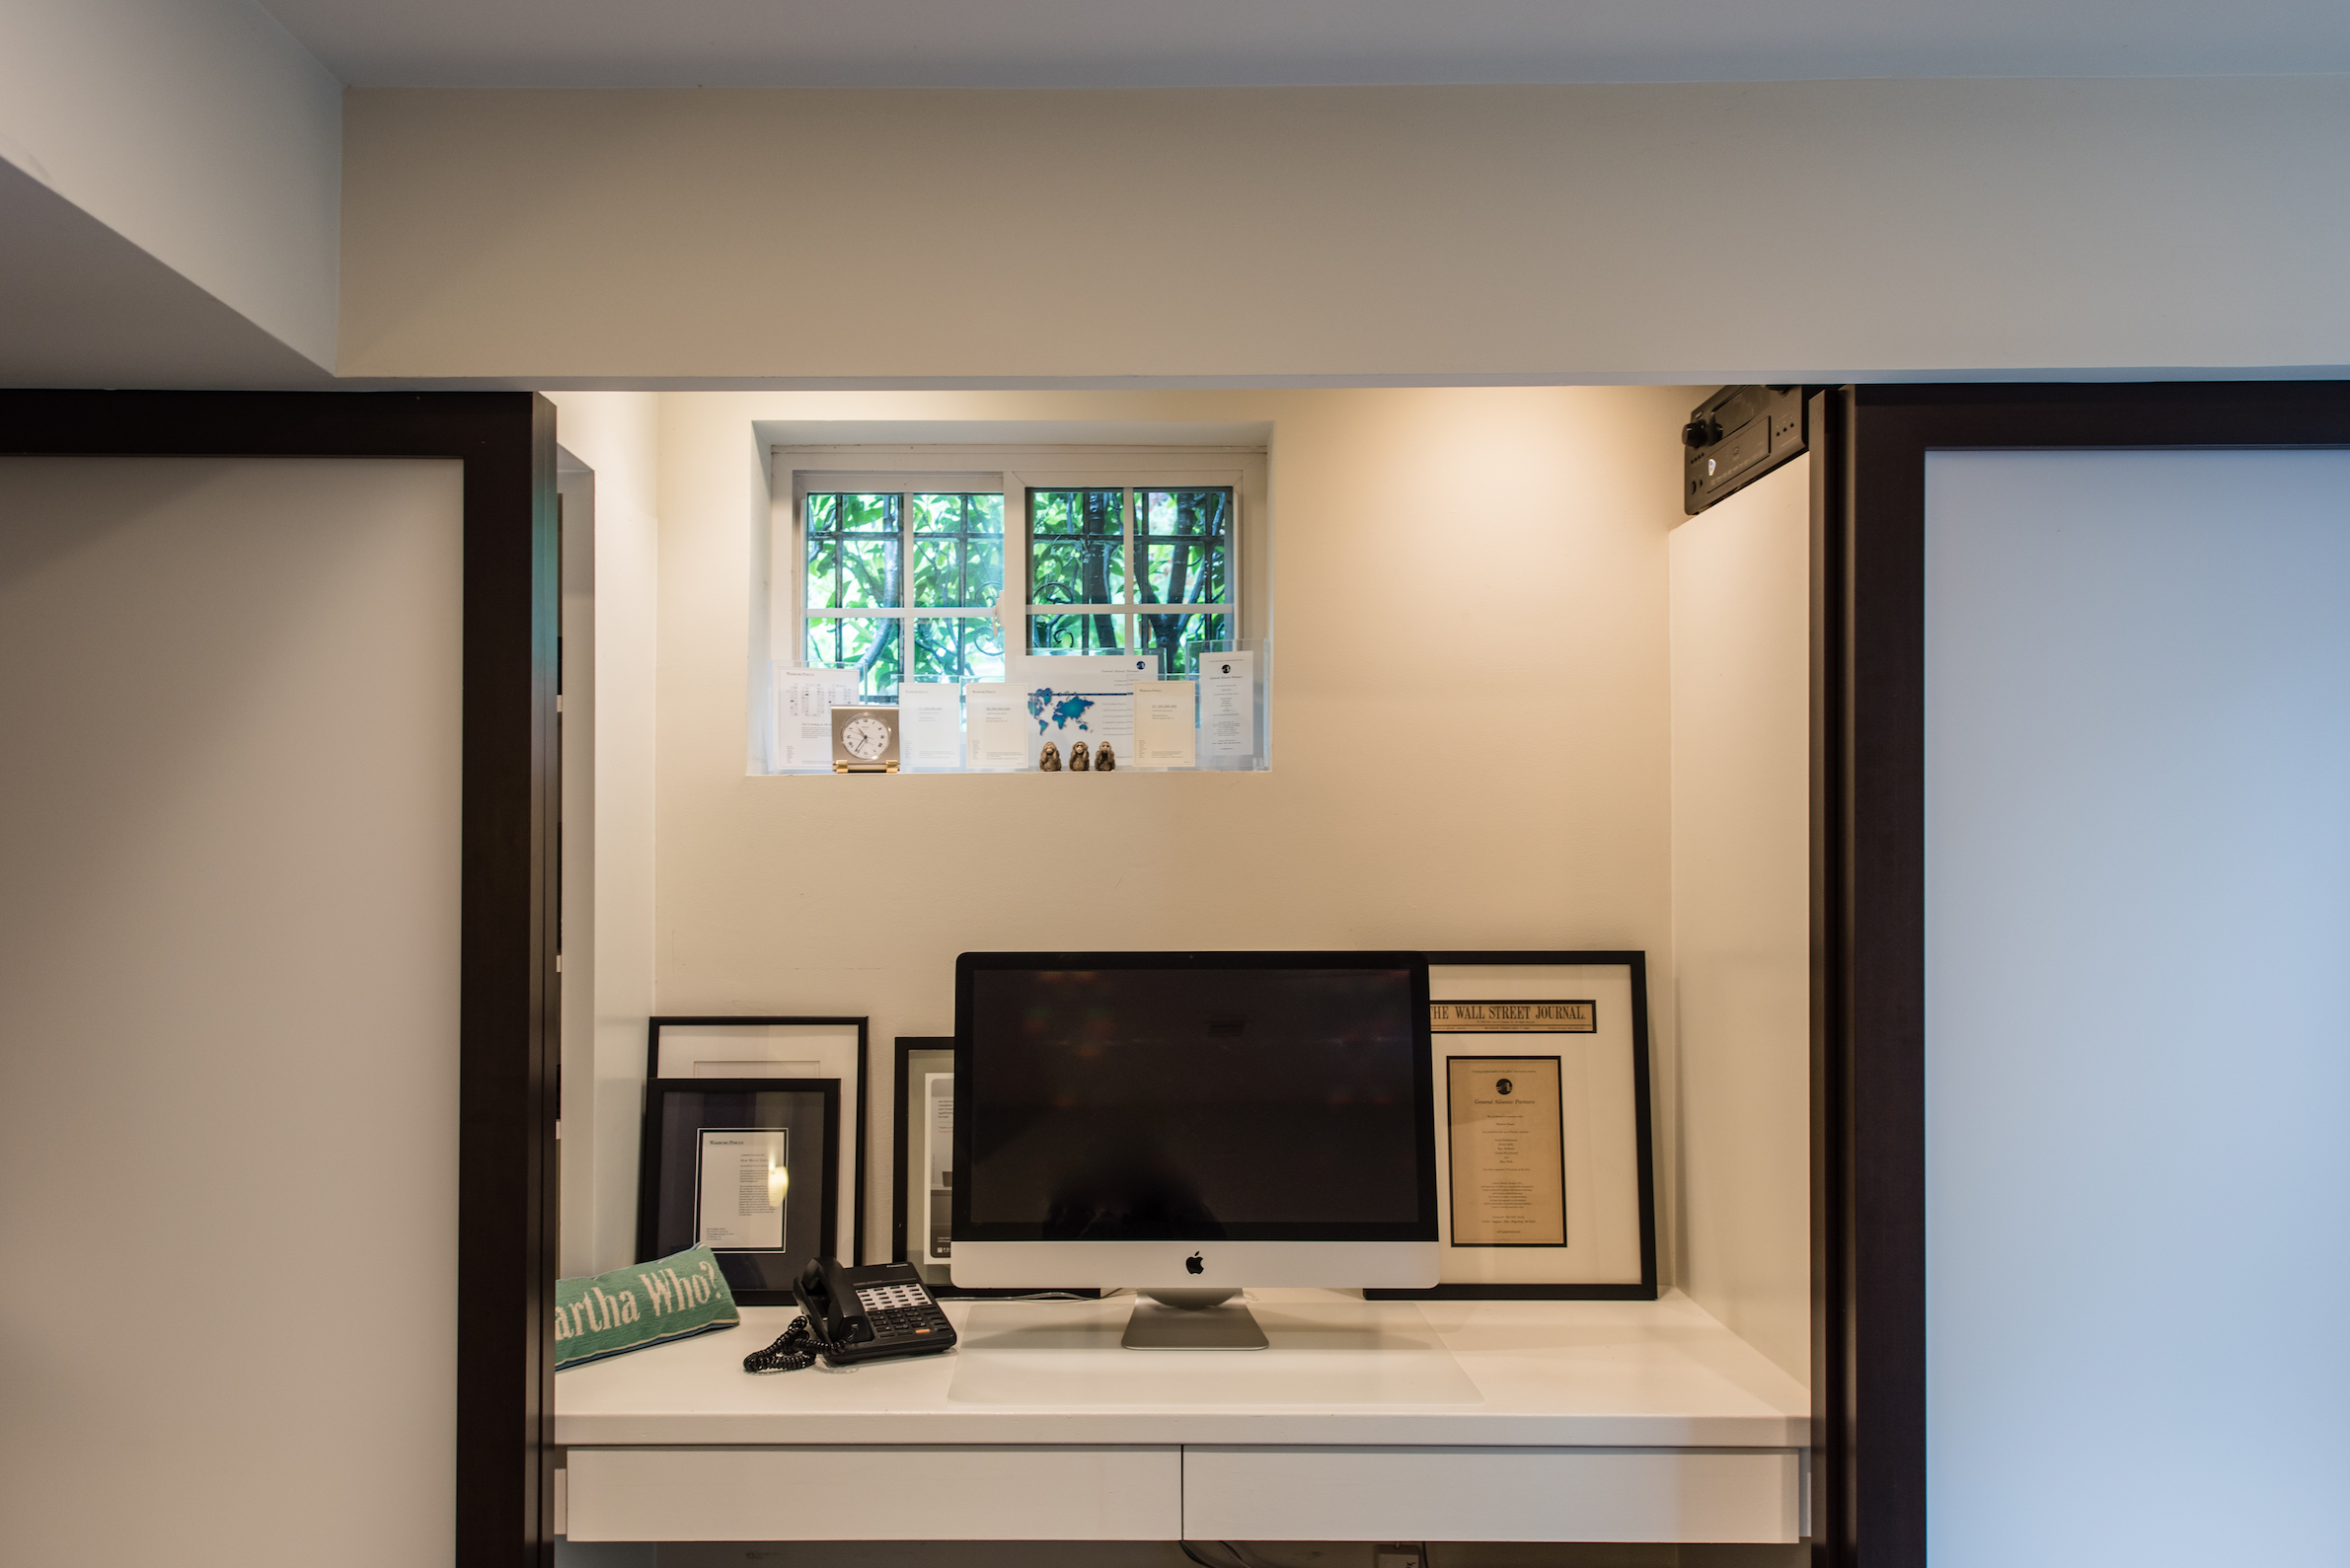 Media Room Built-in Desk